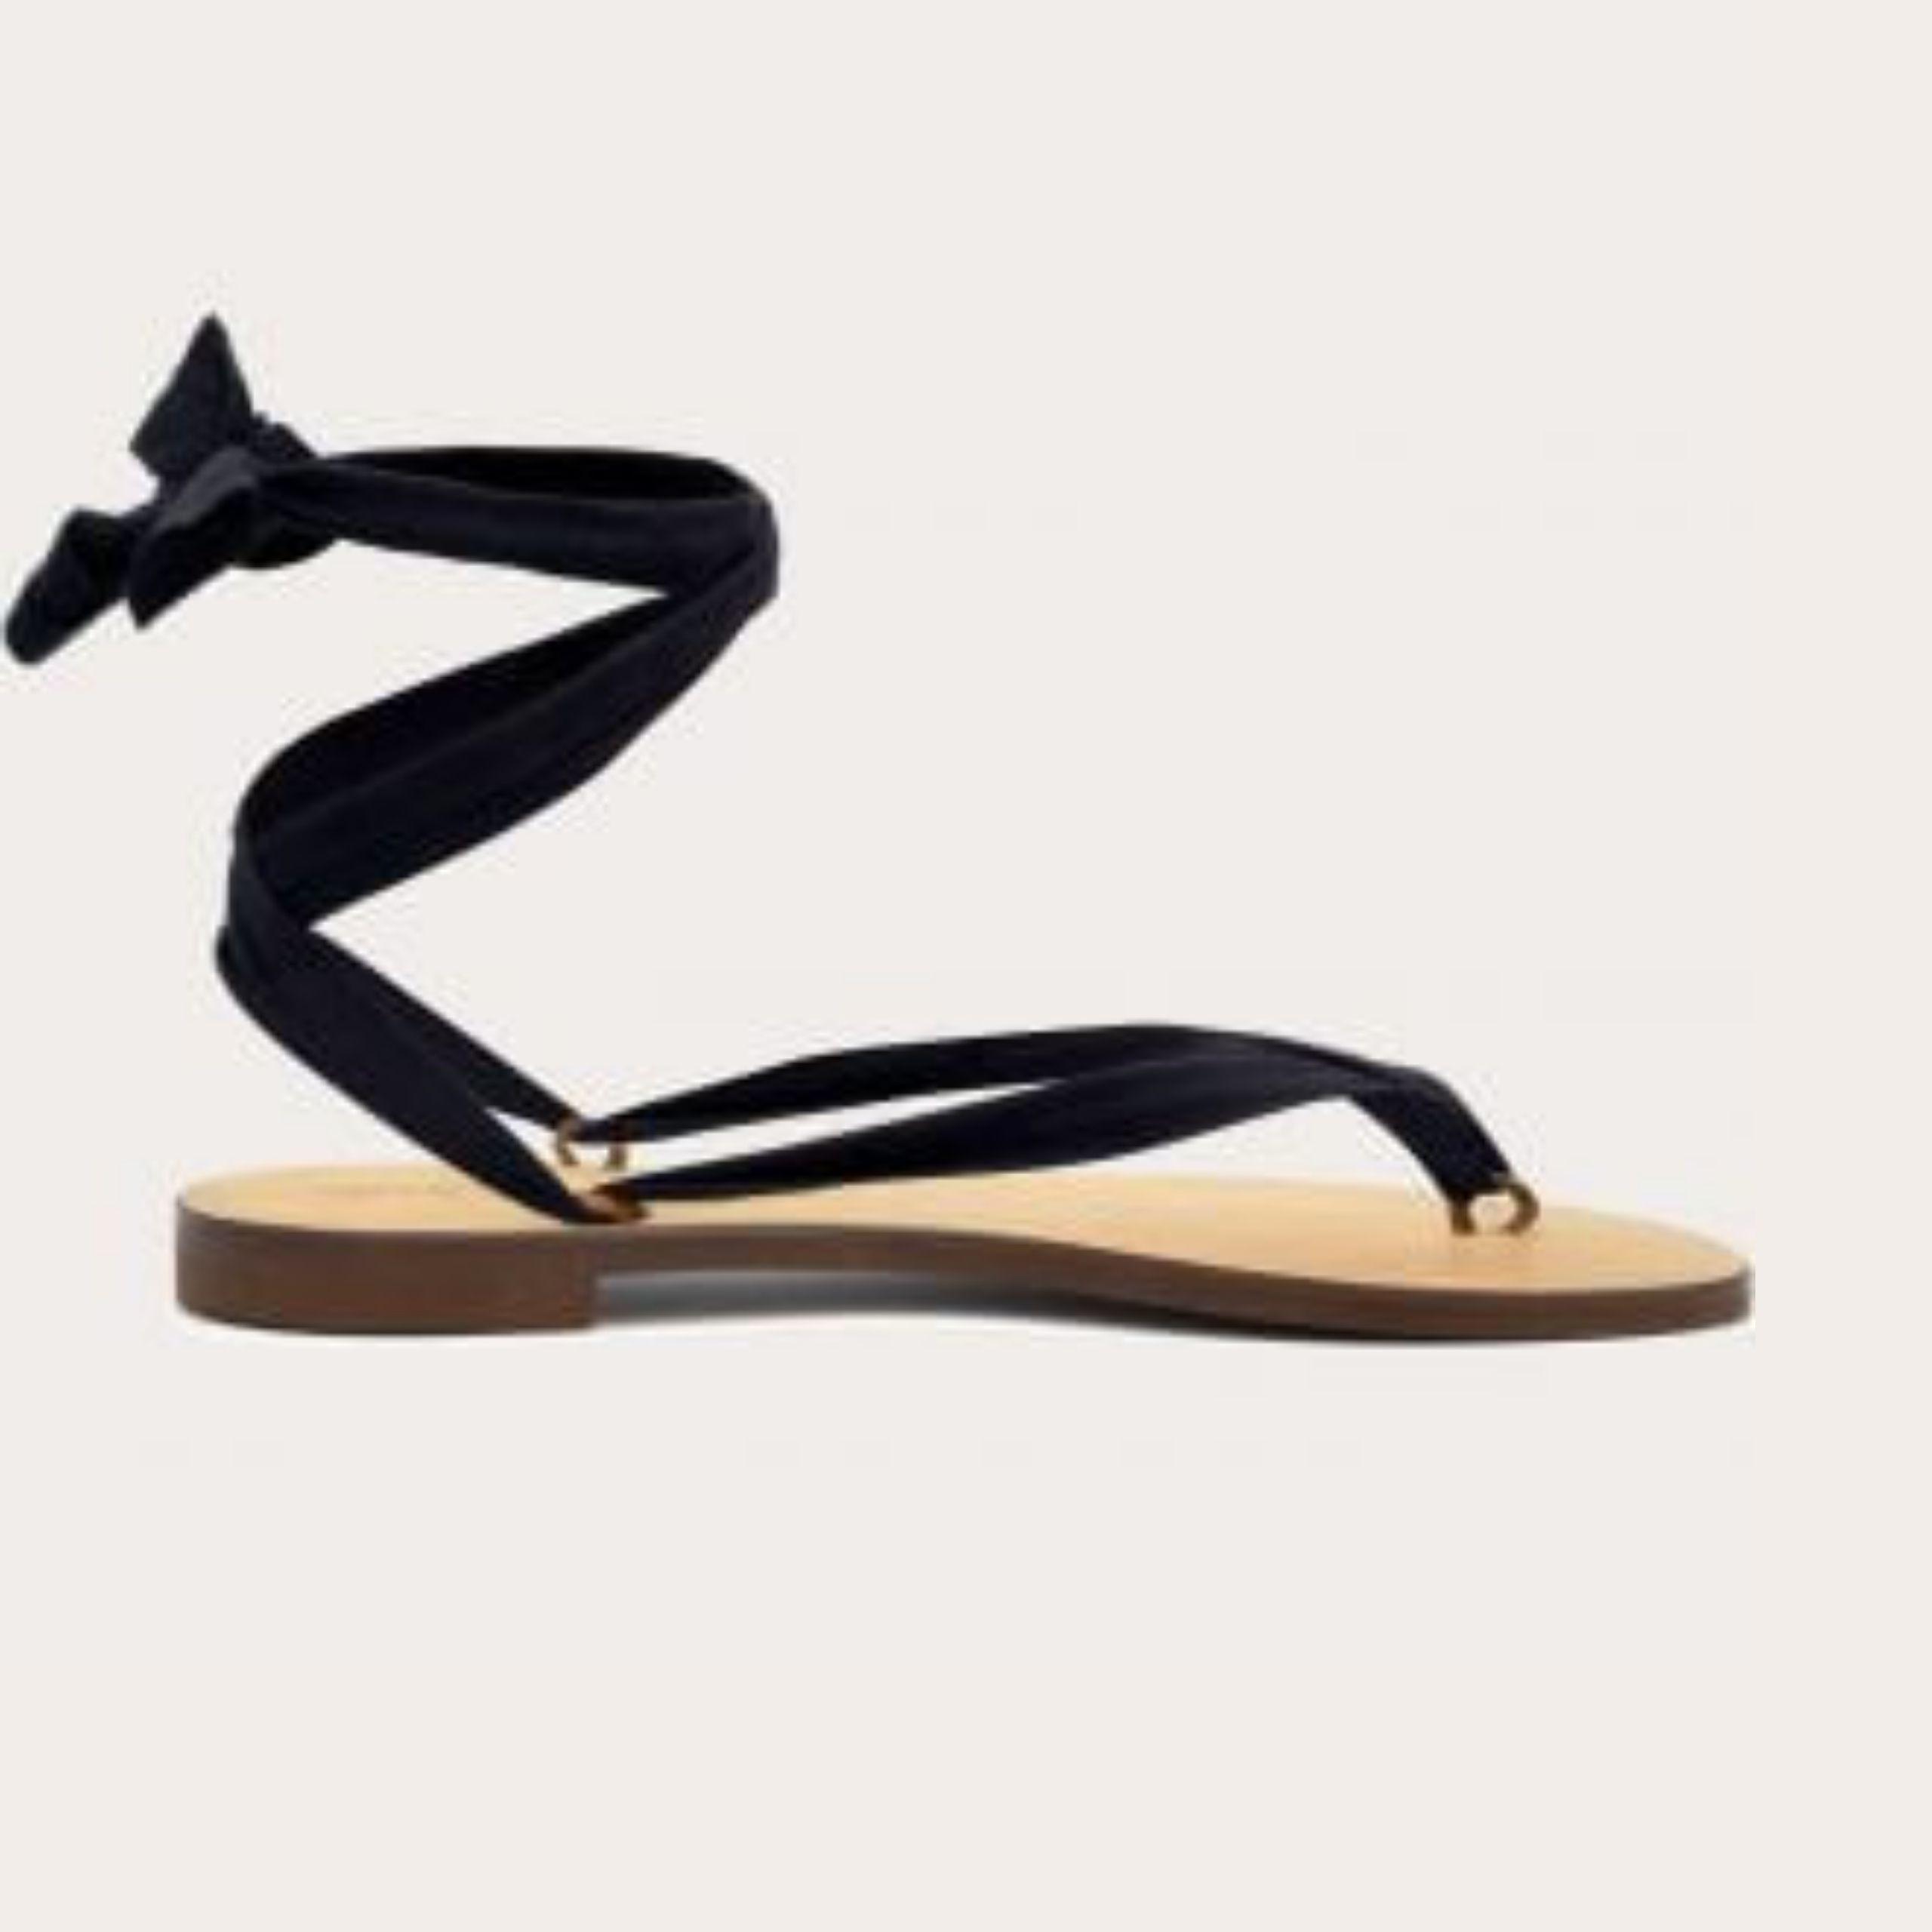 tulum_1_lintsandalen sandals travelsandals vegan sustainable sandals wikkelsandalen